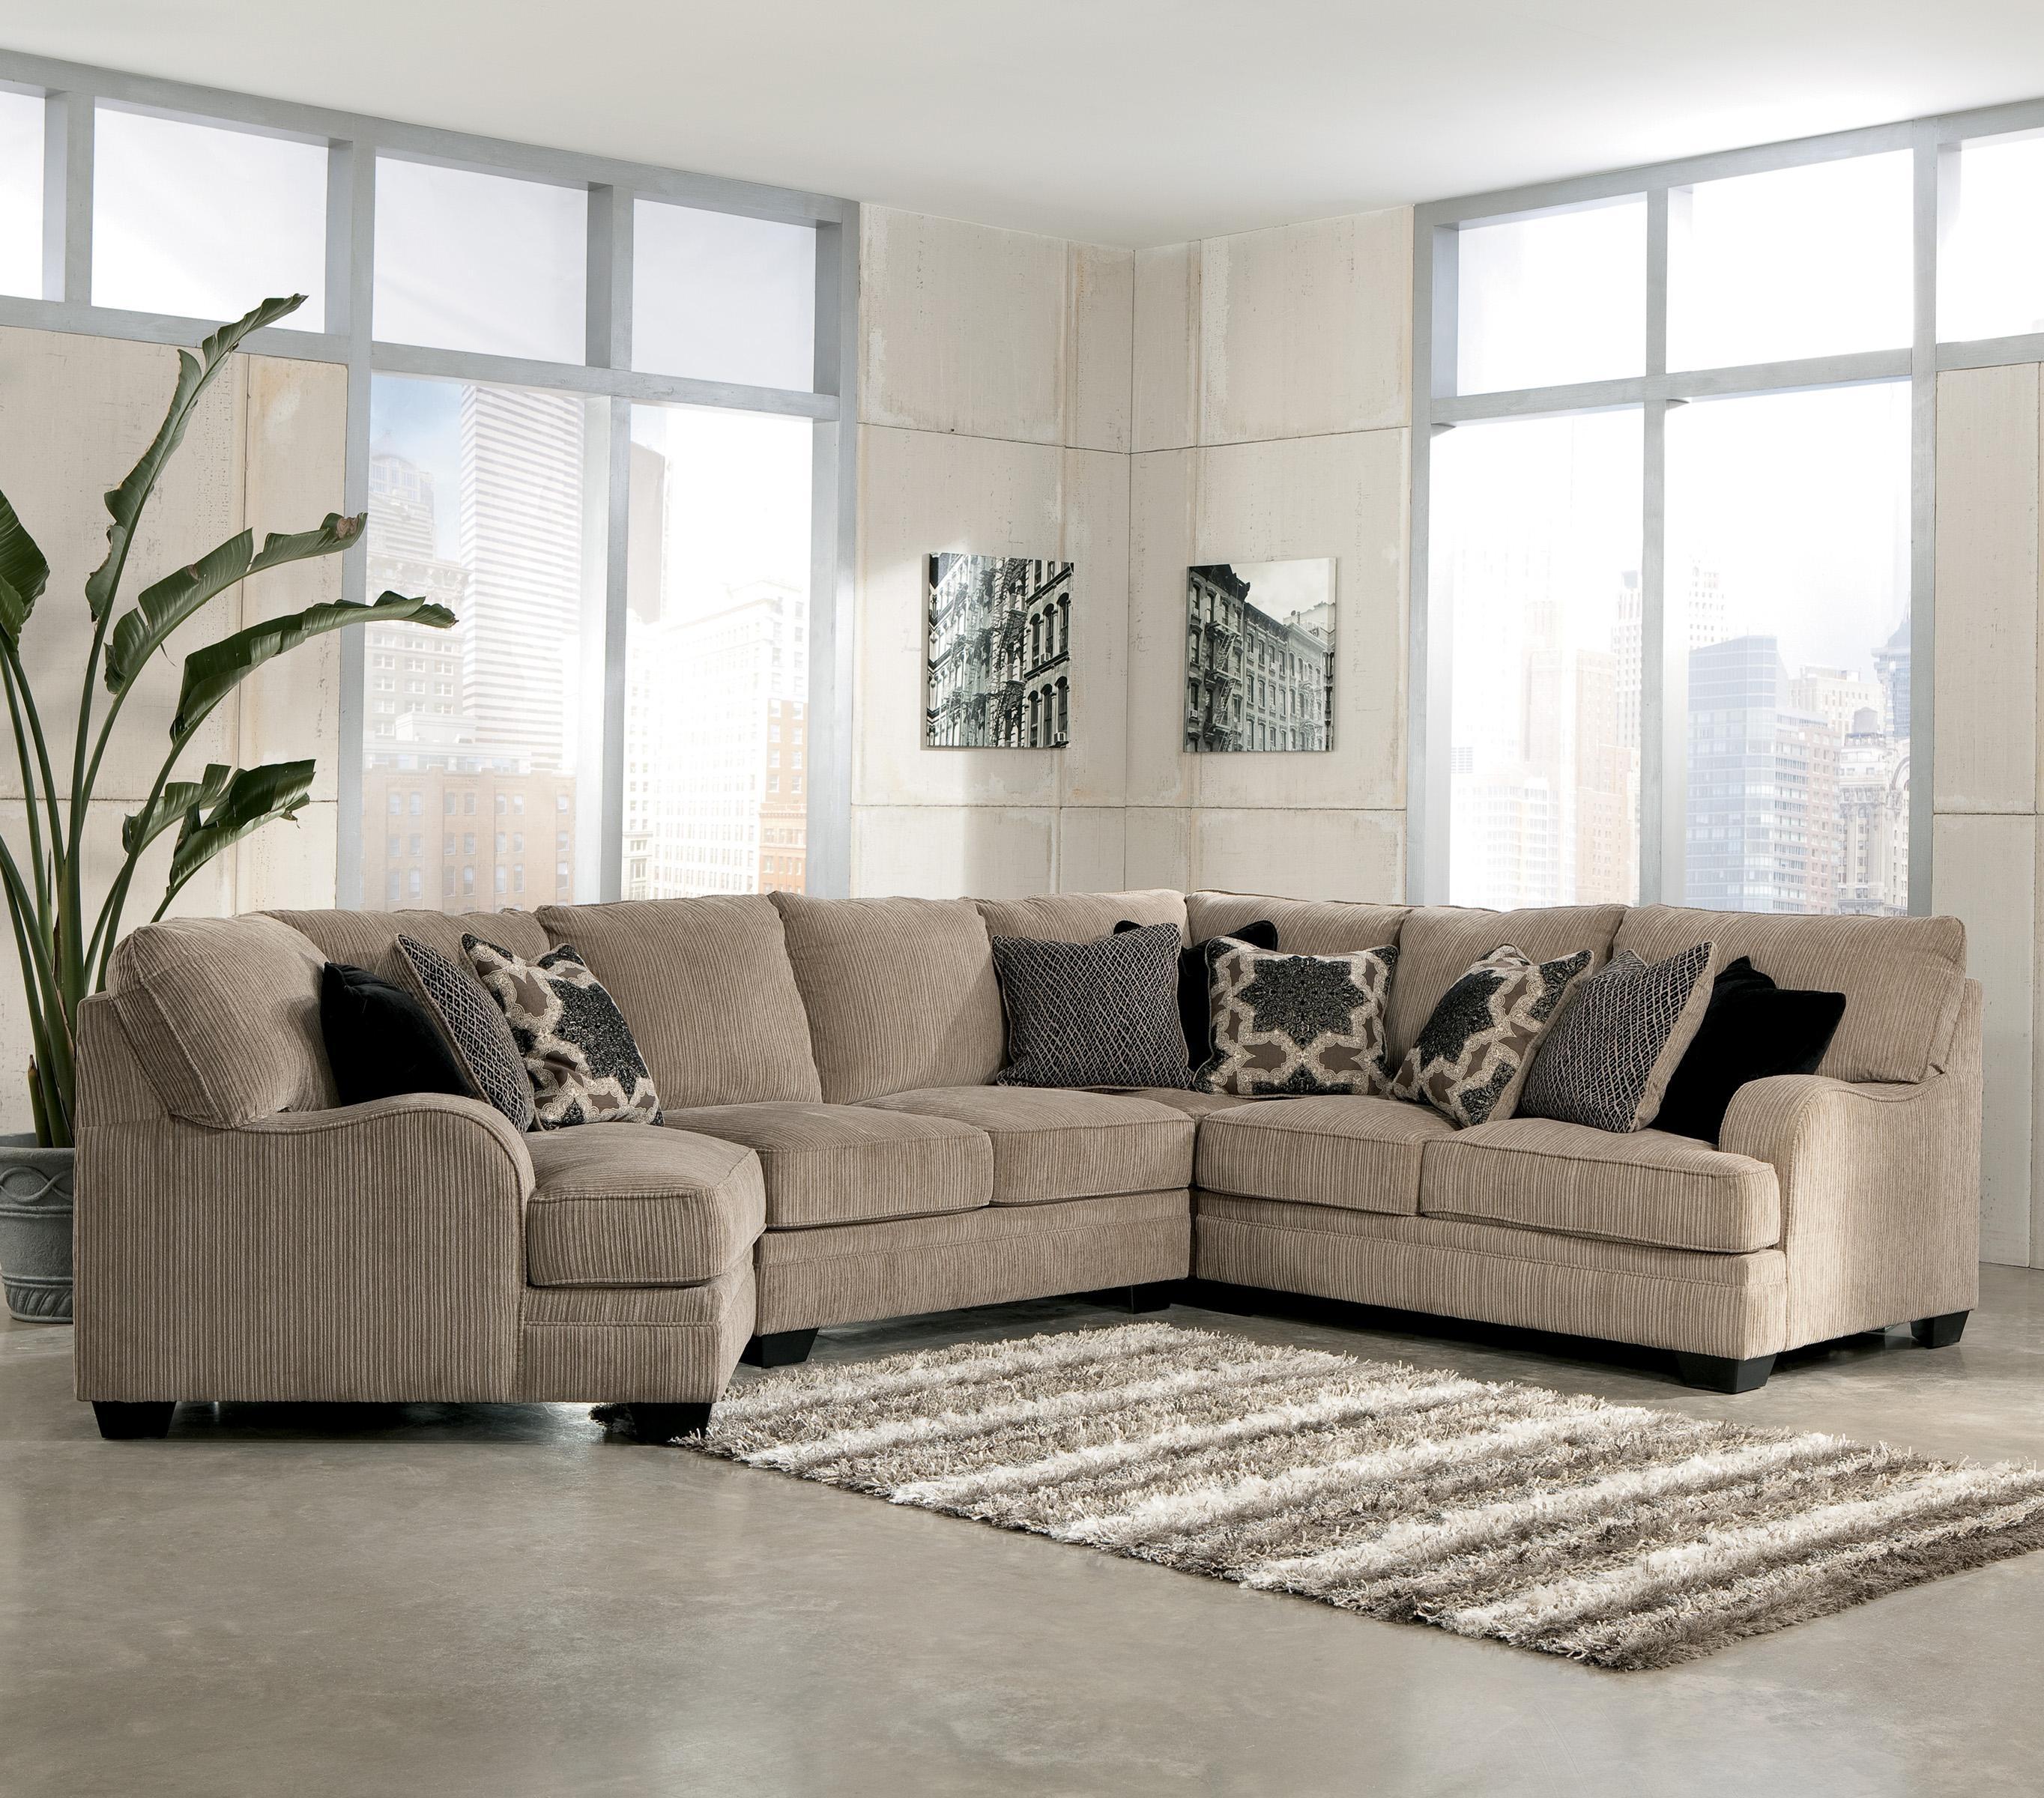 Signature Designashley Katisha – Platinum 4 Piece Sectional Sofa Intended For Blaine 4 Piece Sectionals (Image 19 of 25)